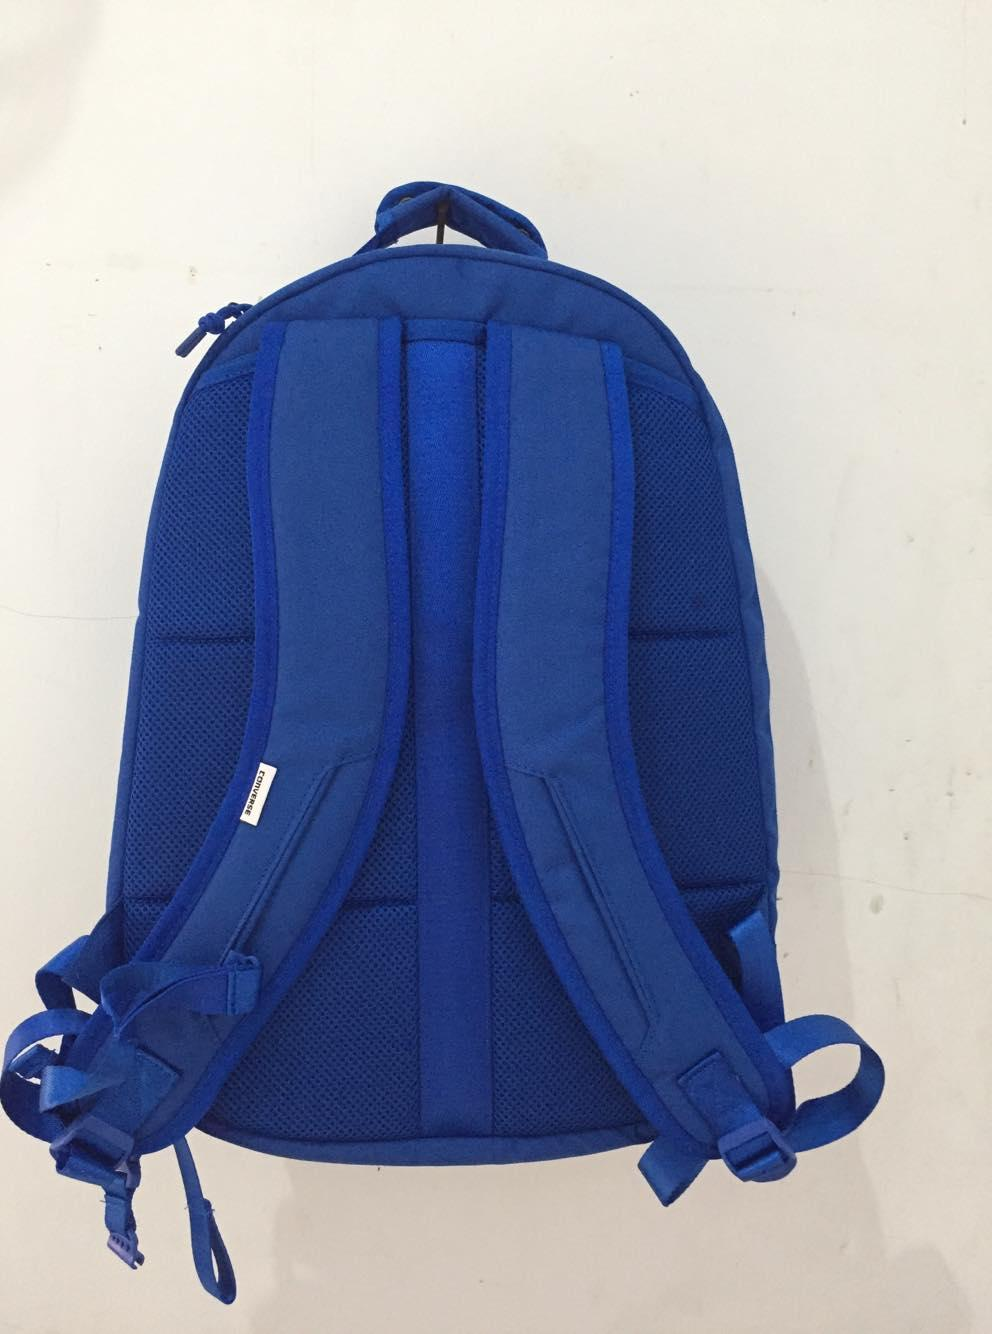 Fitur Tas Ransel Converse Seasonal Mesh Mtrial Blue Laptop Slot Dan Persib 4